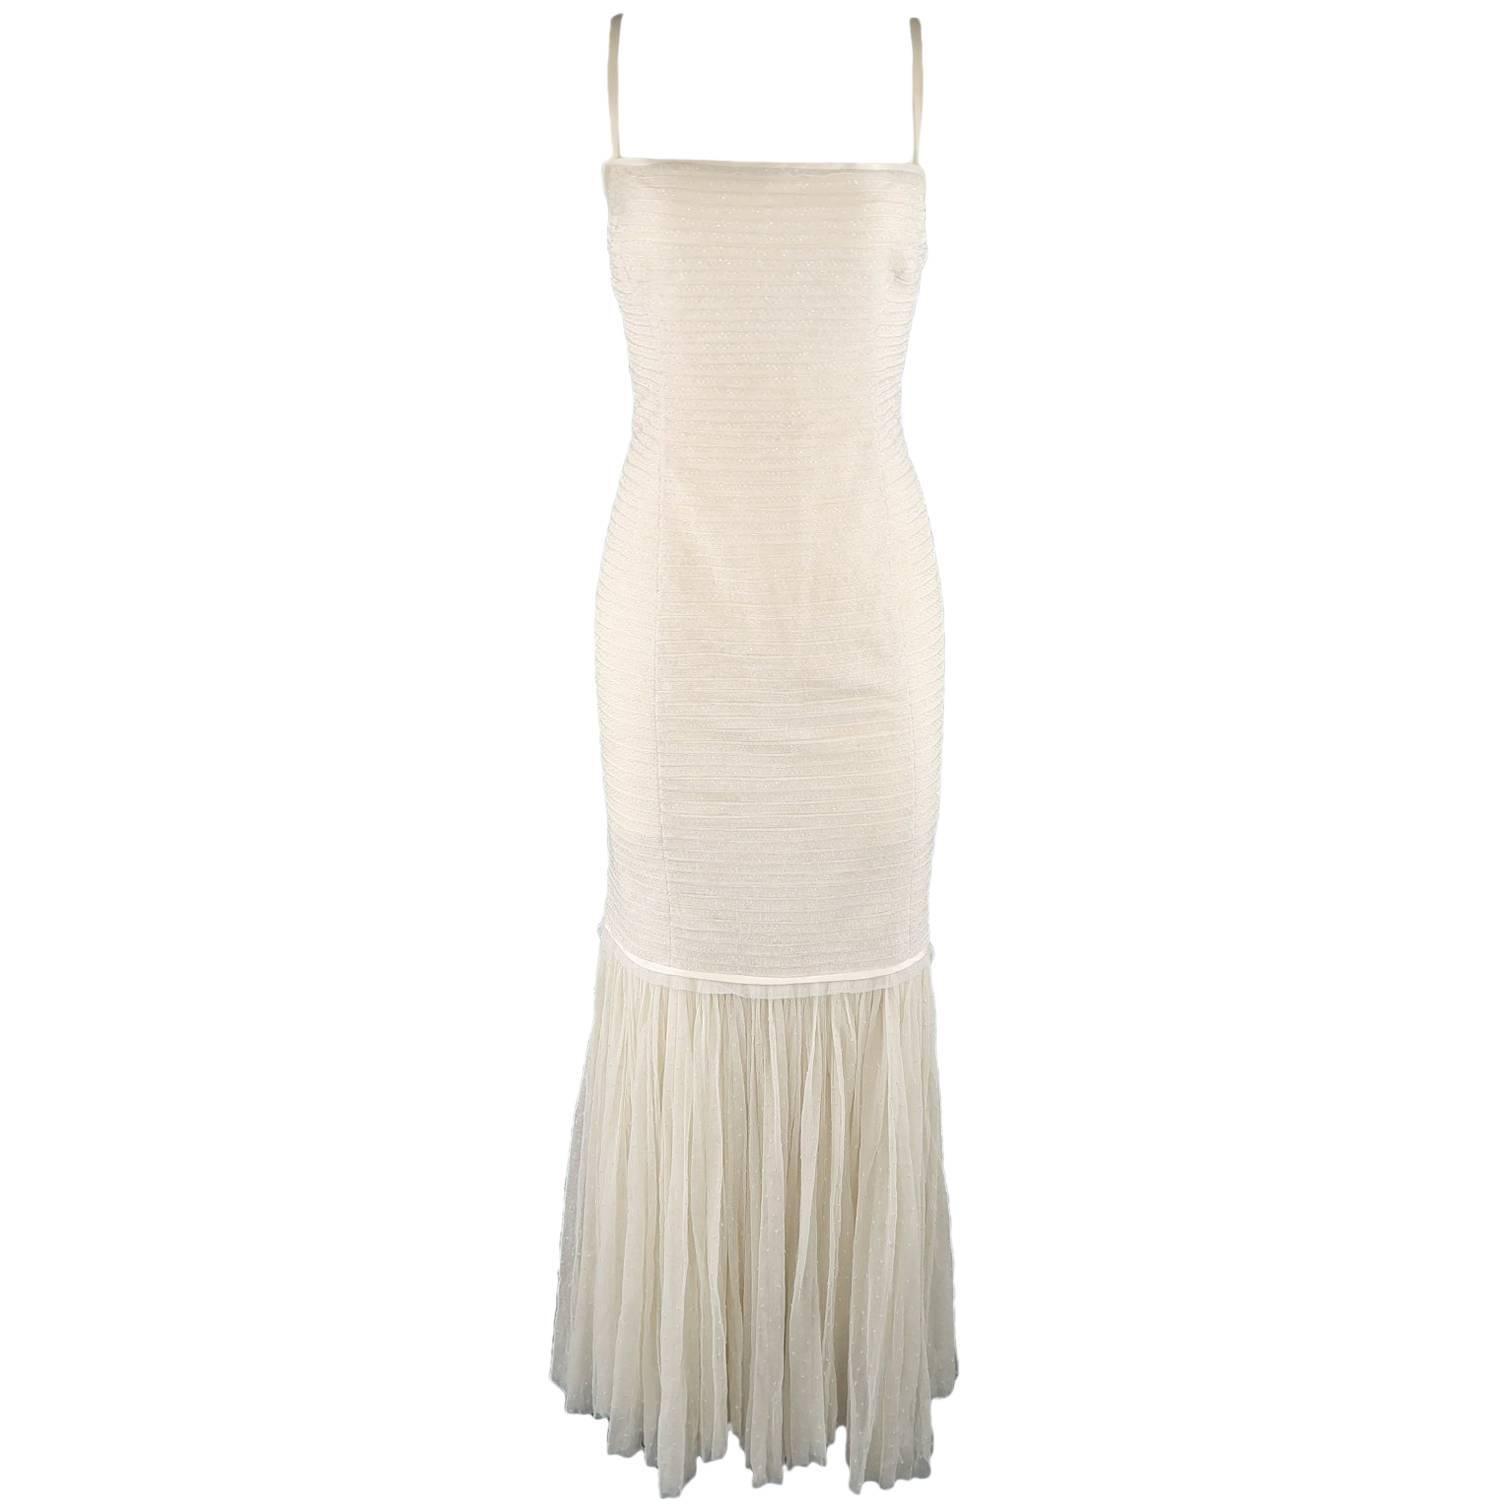 Ralph Lauren Gown - Collection - Cream Beaded Drop Waist Tulle Dress